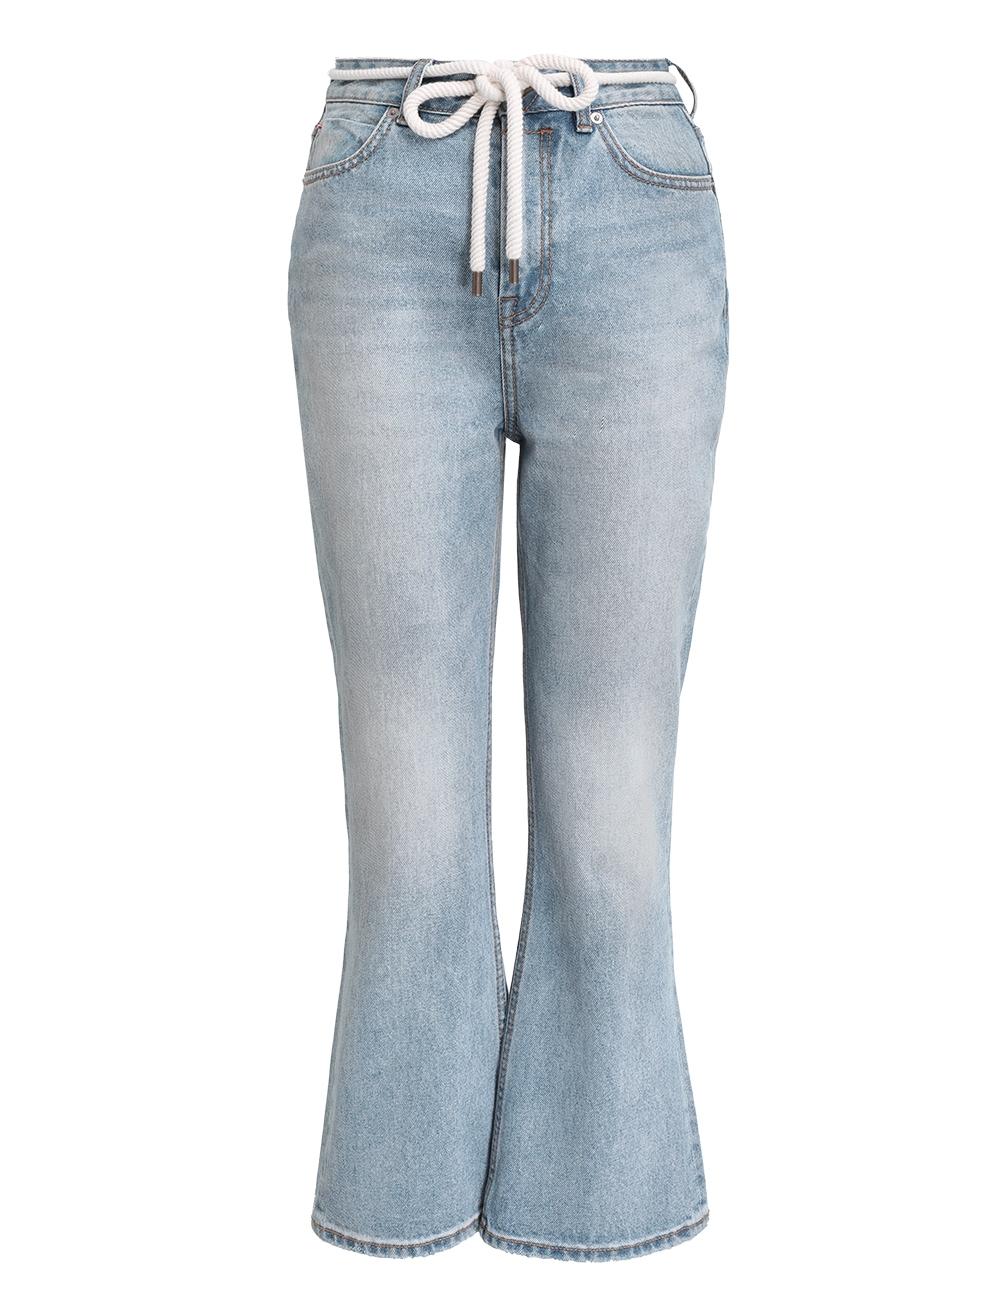 Cassia Cropped Jean